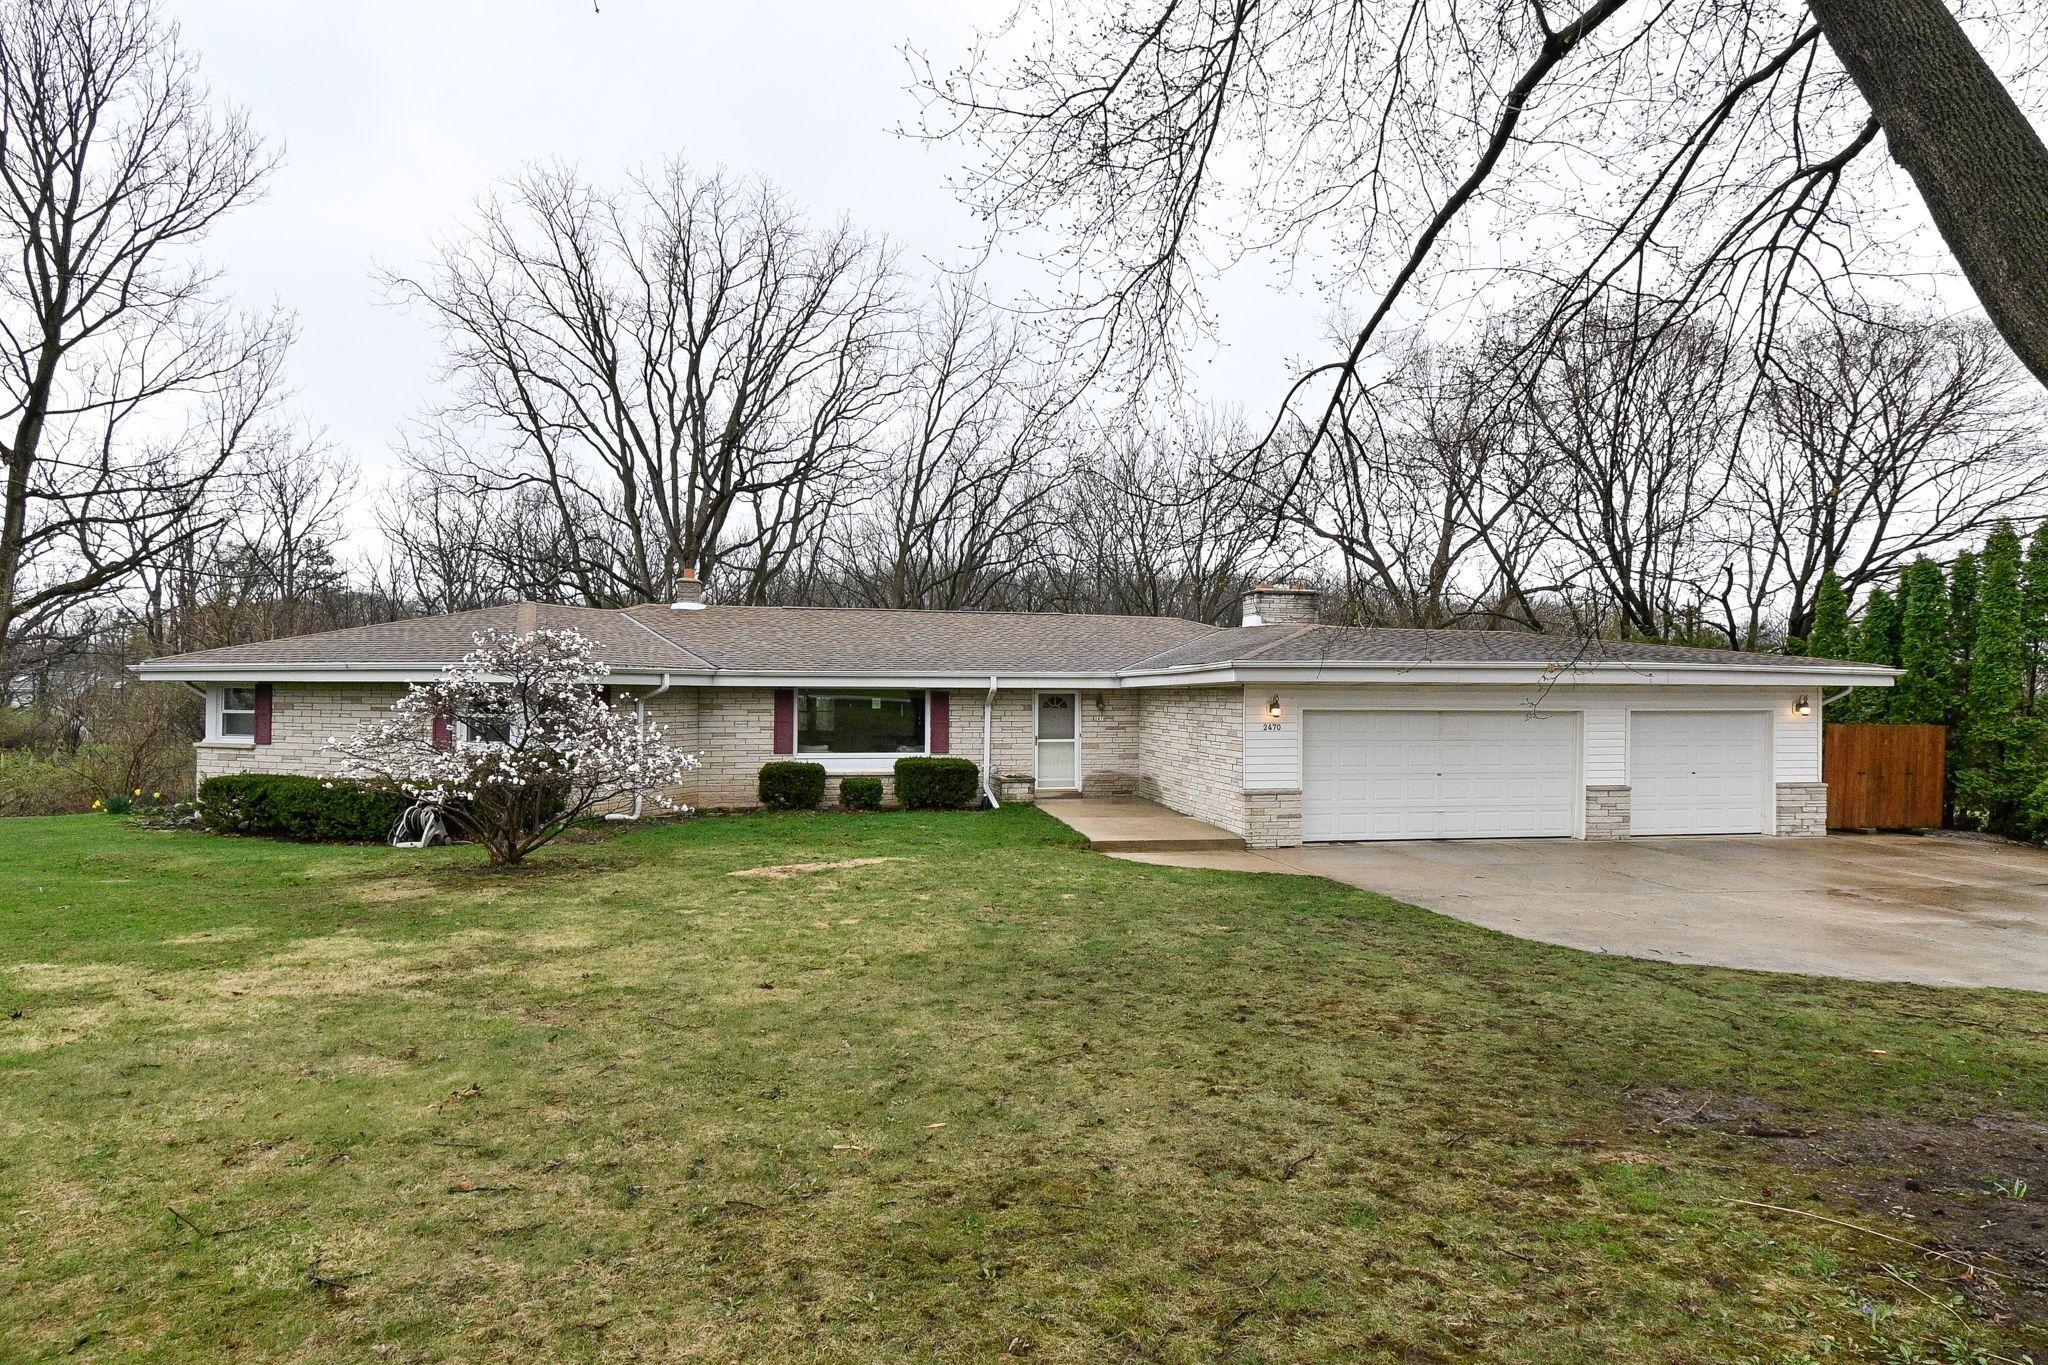 2470 Rockway Ln E, Brookfield, Wisconsin 53005, 4 Bedrooms Bedrooms, ,3 BathroomsBathrooms,Single-Family,For Sale,Rockway Ln E,1734331